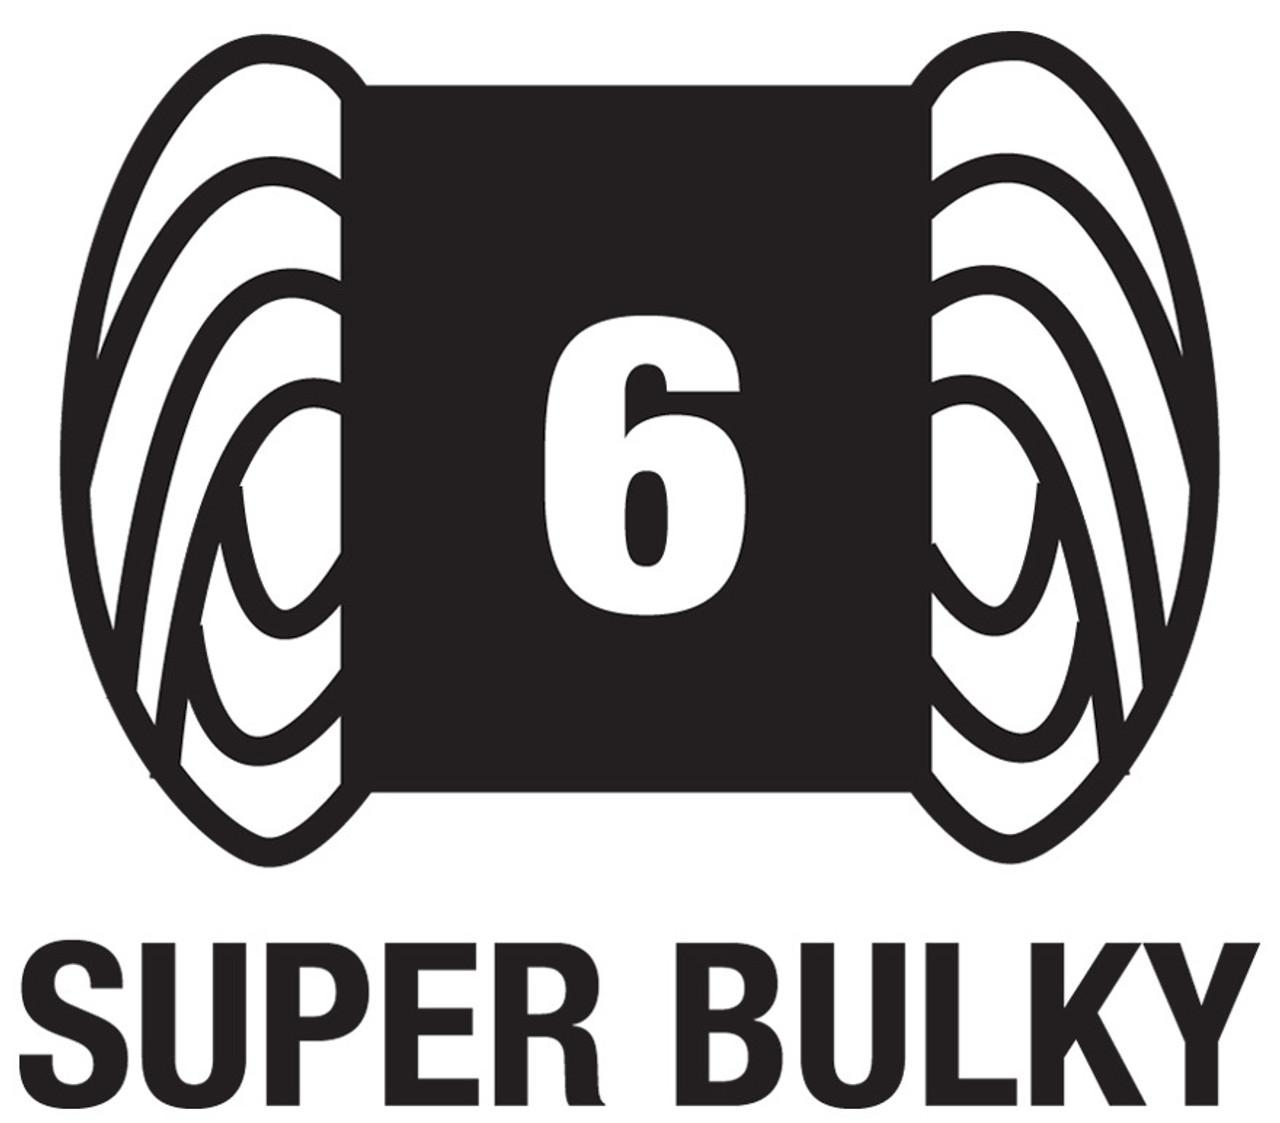 6-Super Bulky